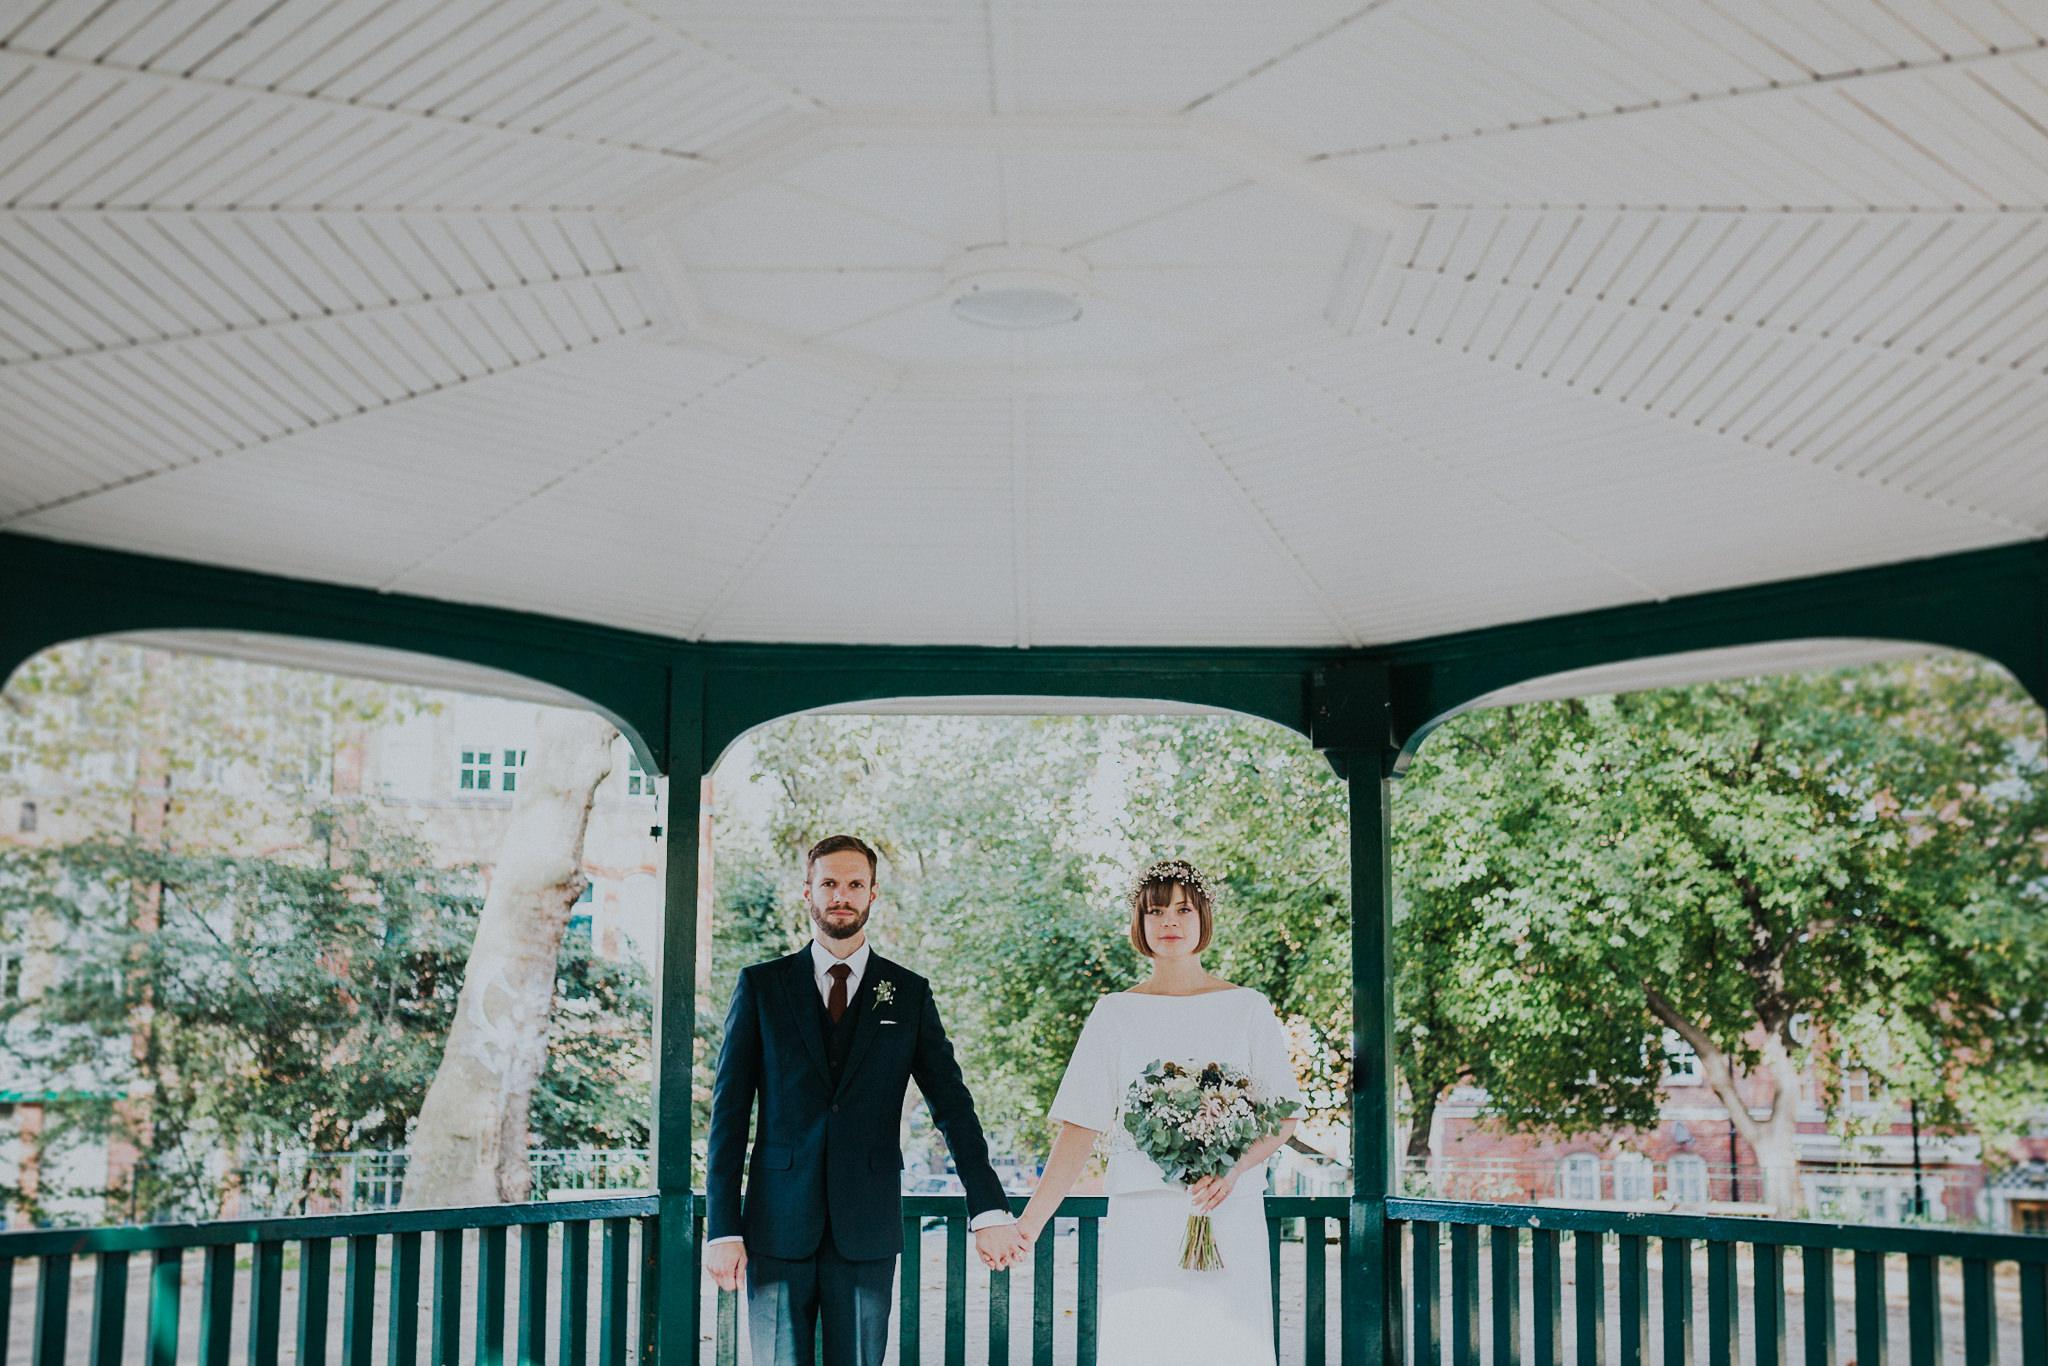 kate-gray-london-wedding-photography-54.jpg